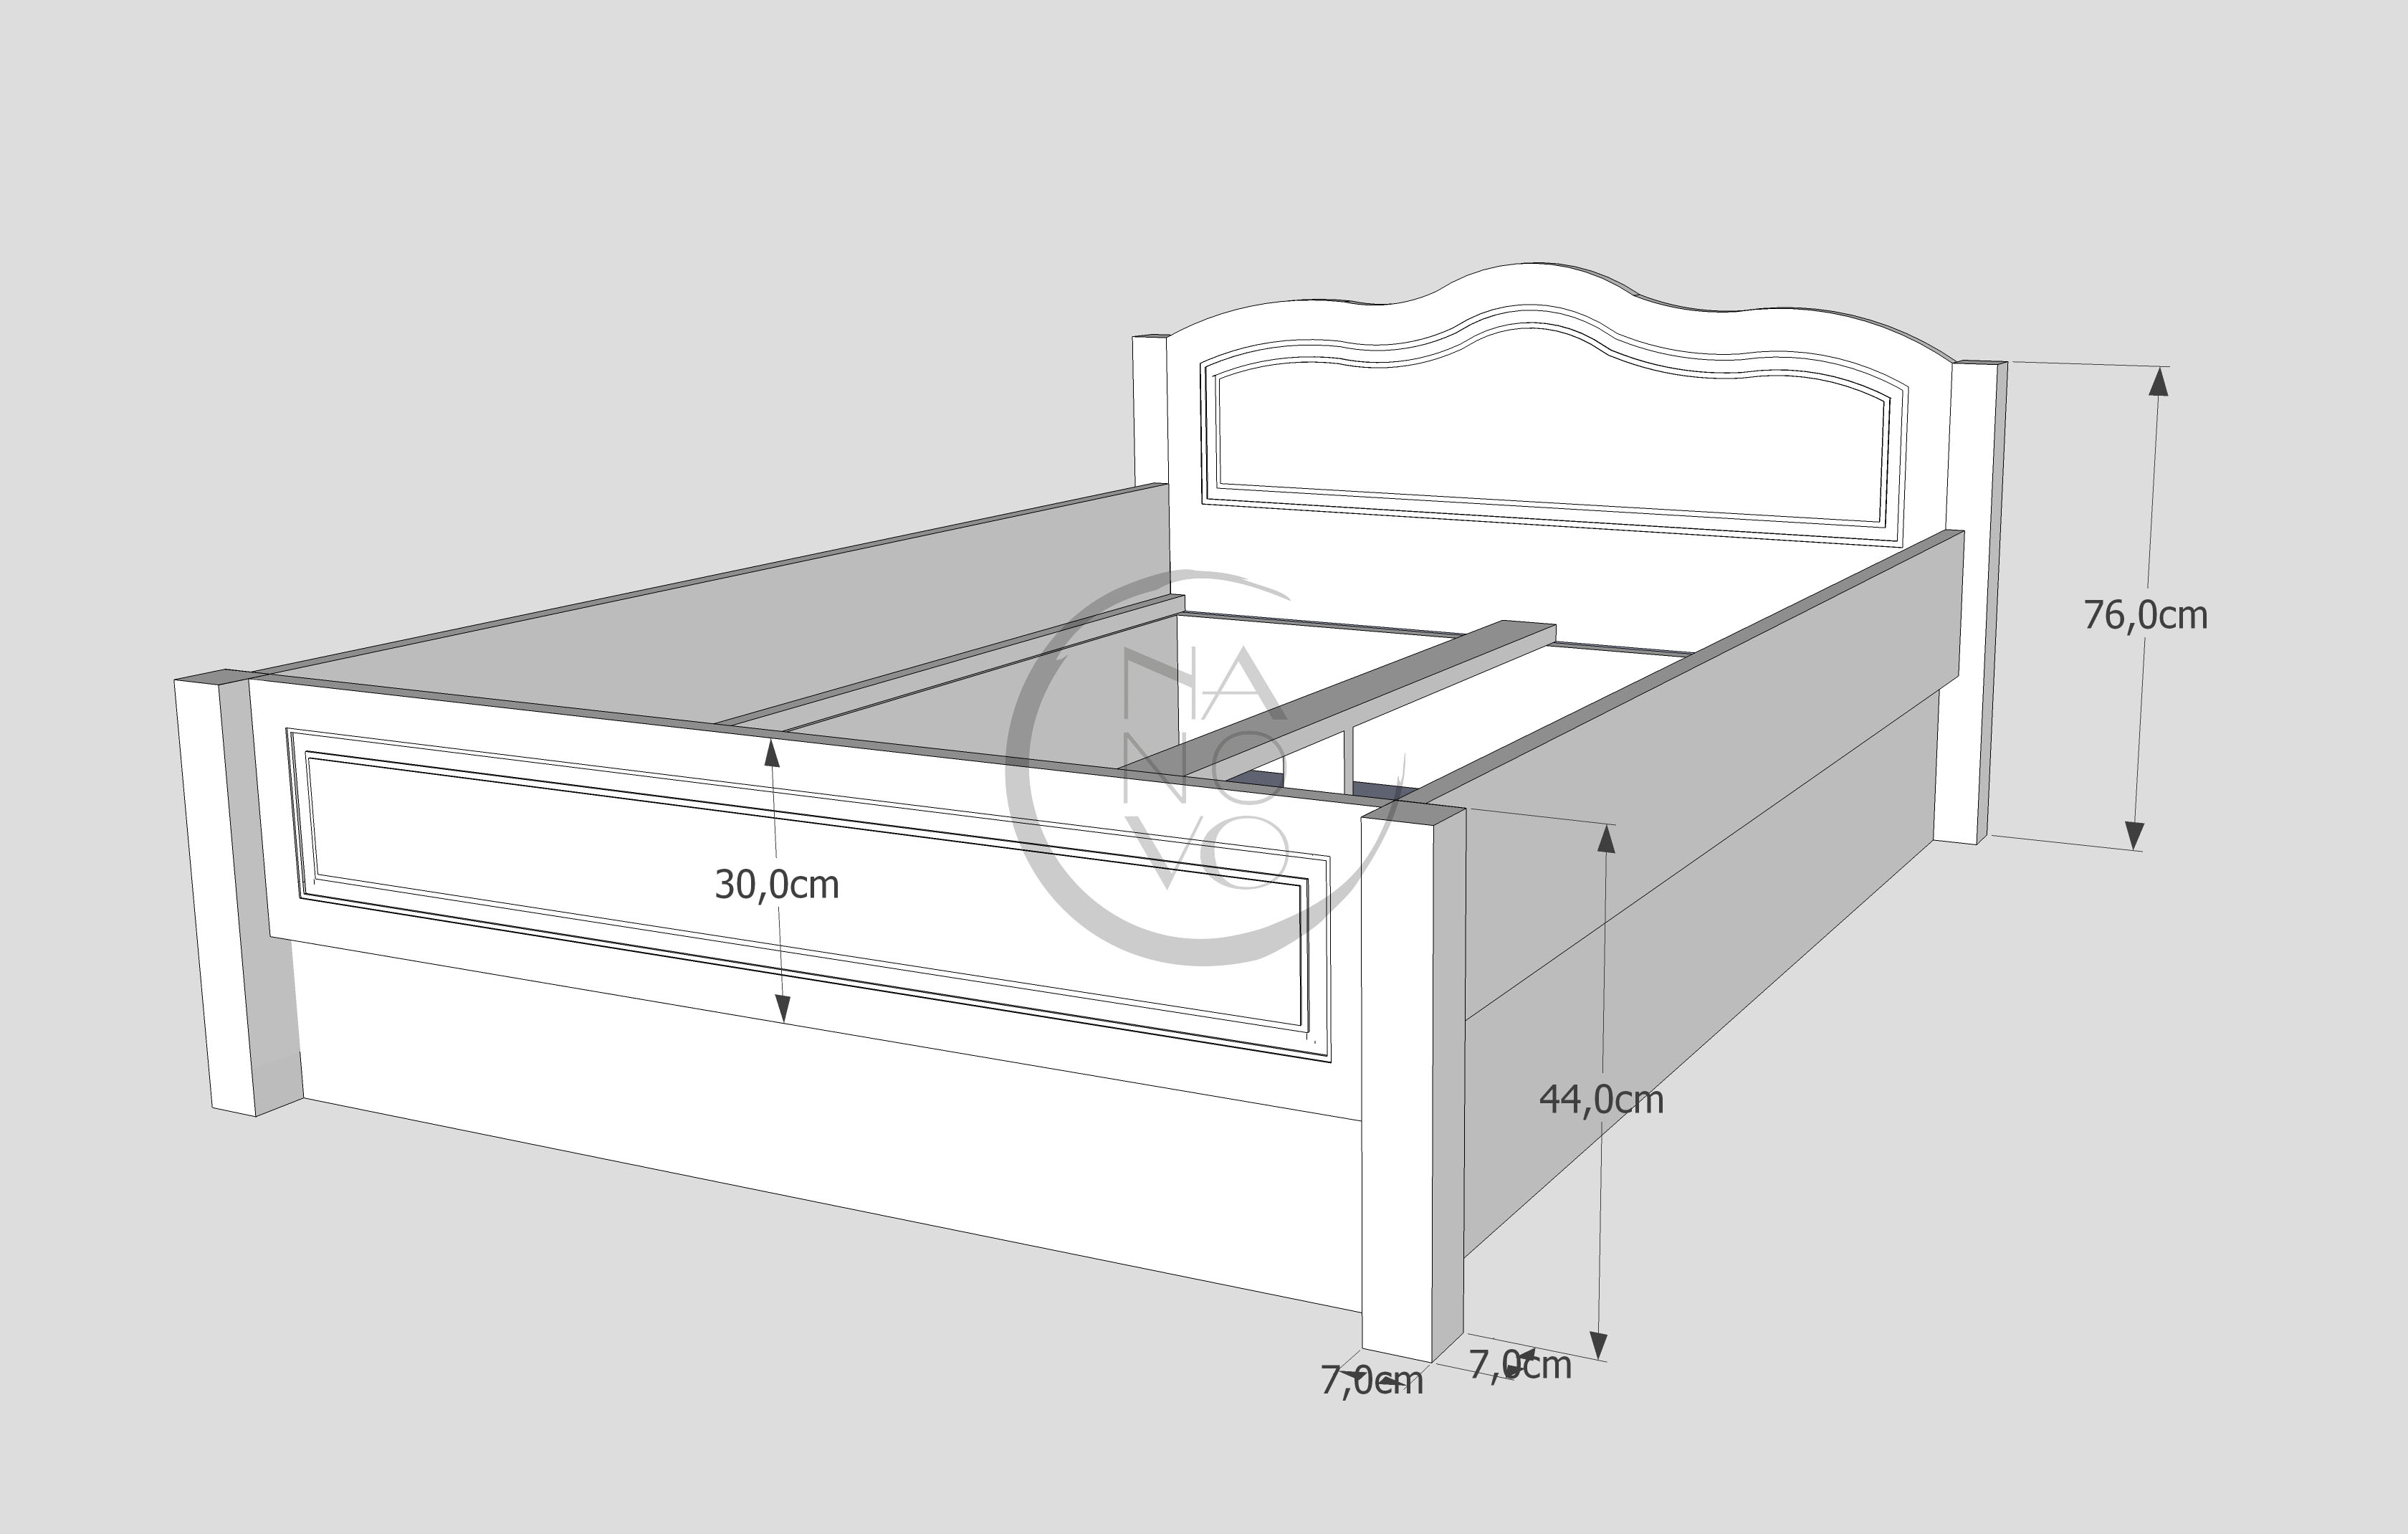 Łóżko Merida skrzynia.jpg